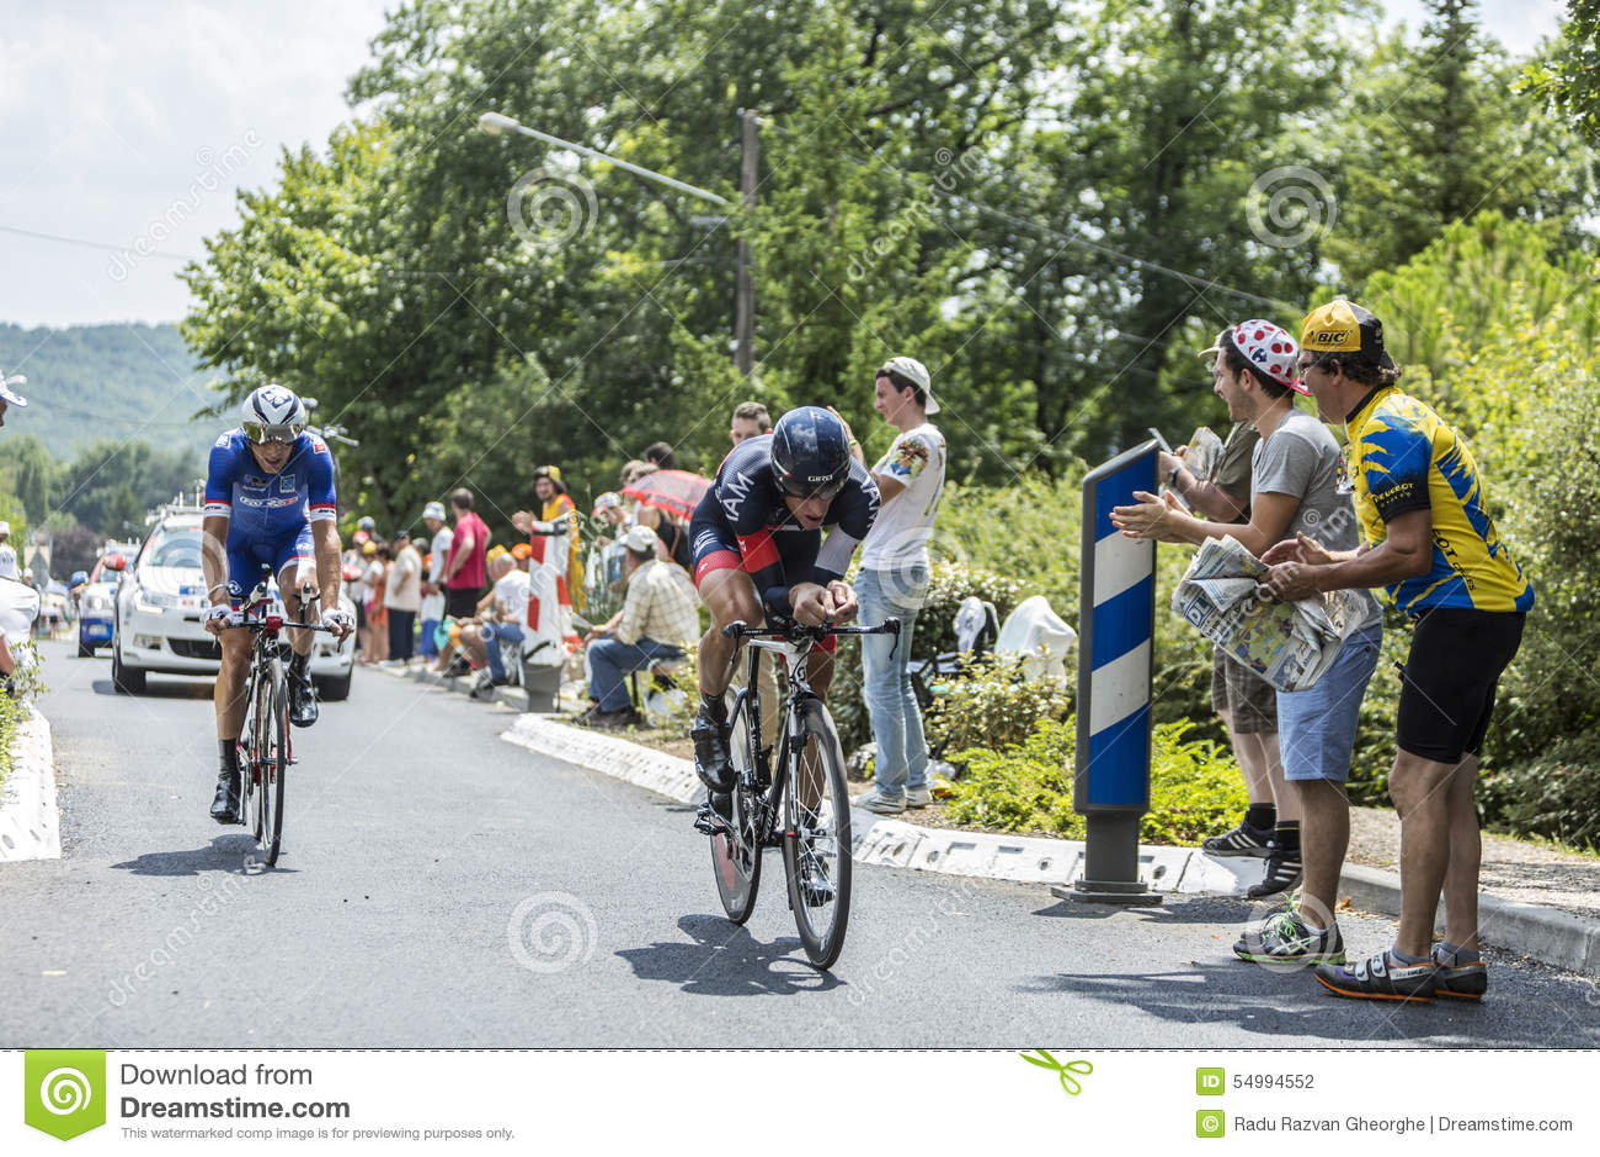 2 велосипедист во время следа времени - Тур-де-Франс 2014